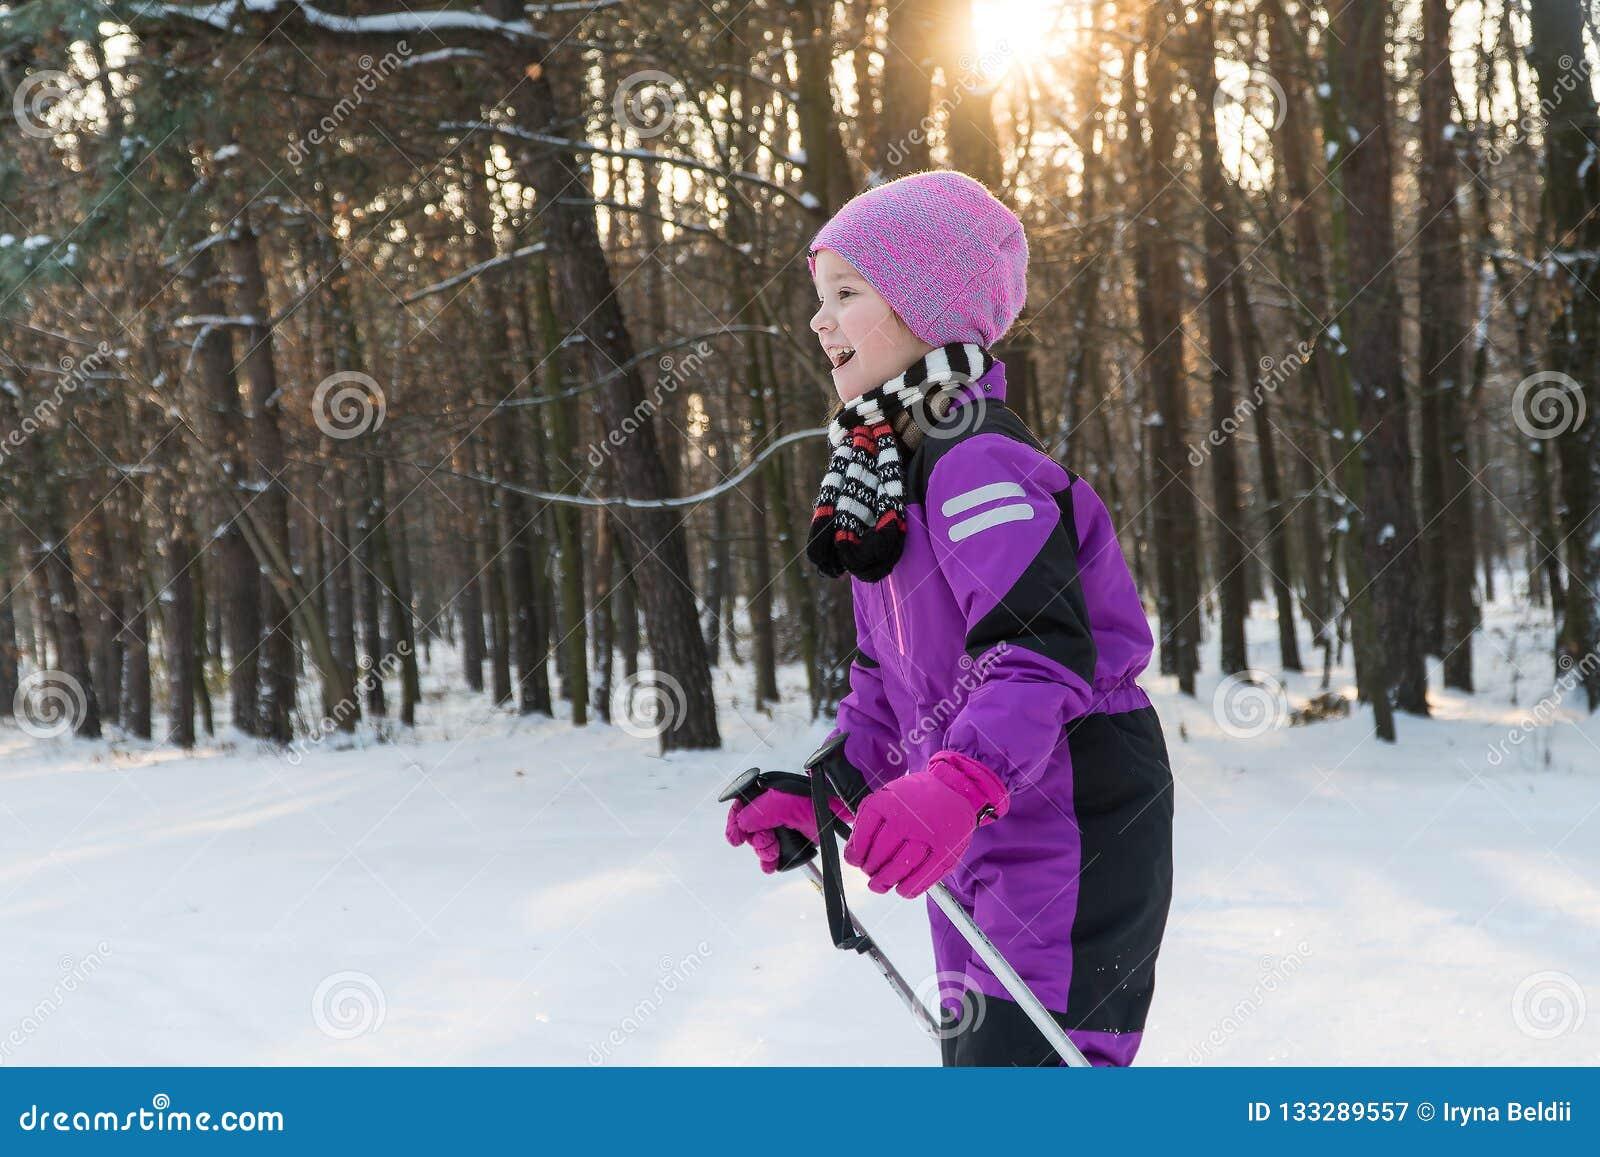 Child rides on skis. forest in winter winter ski child